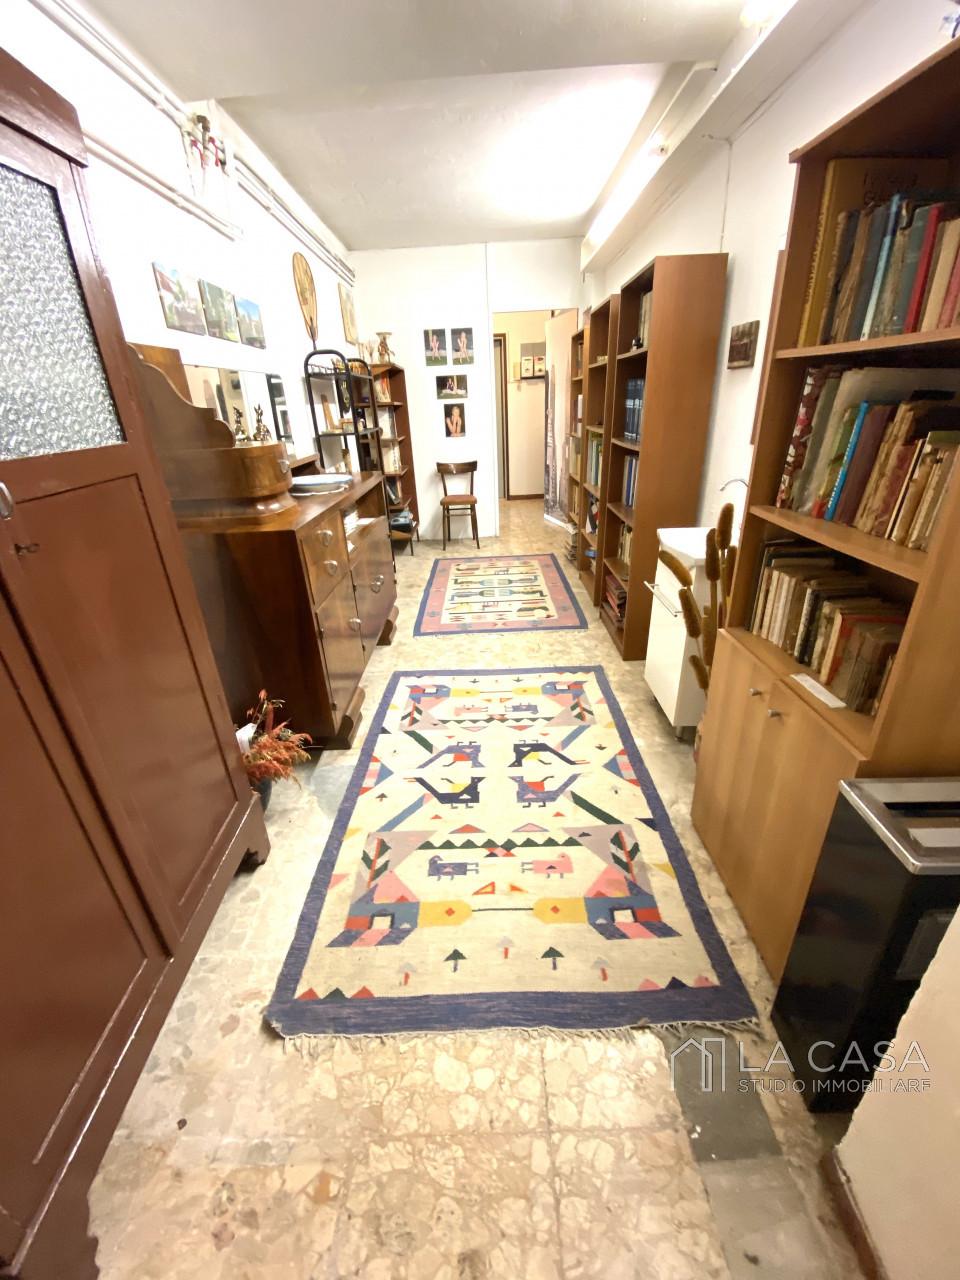 Palazzo plurifamiliare in vendita a Valvasone Arzene - Rif. P3 https://images.gestionaleimmobiliare.it/foto/annunci/200827/2284141/1280x1280/004__img_3696_wmk_0.jpg